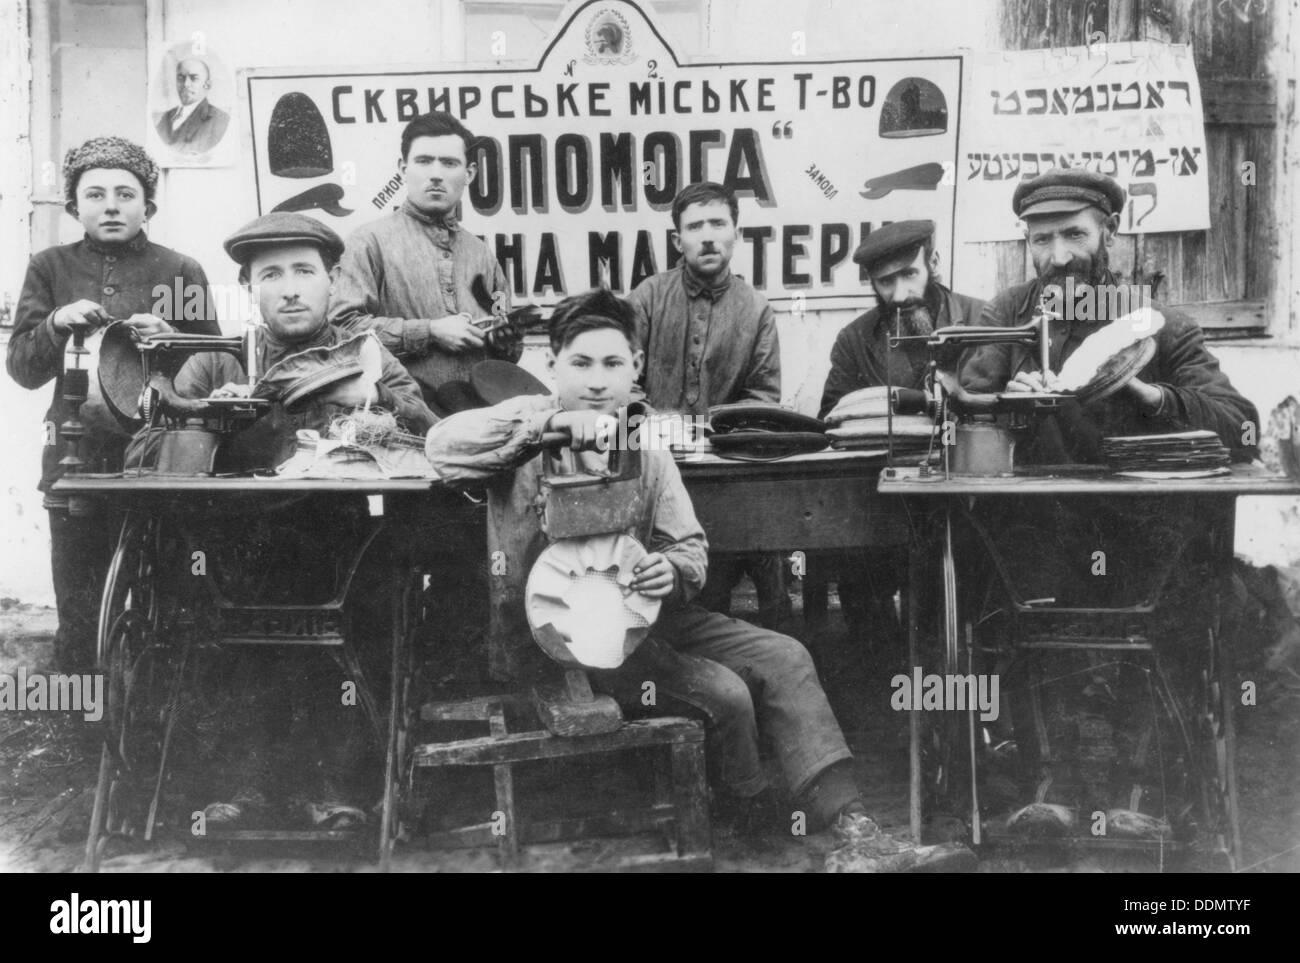 Russian Jews, c1920s? - Stock Image